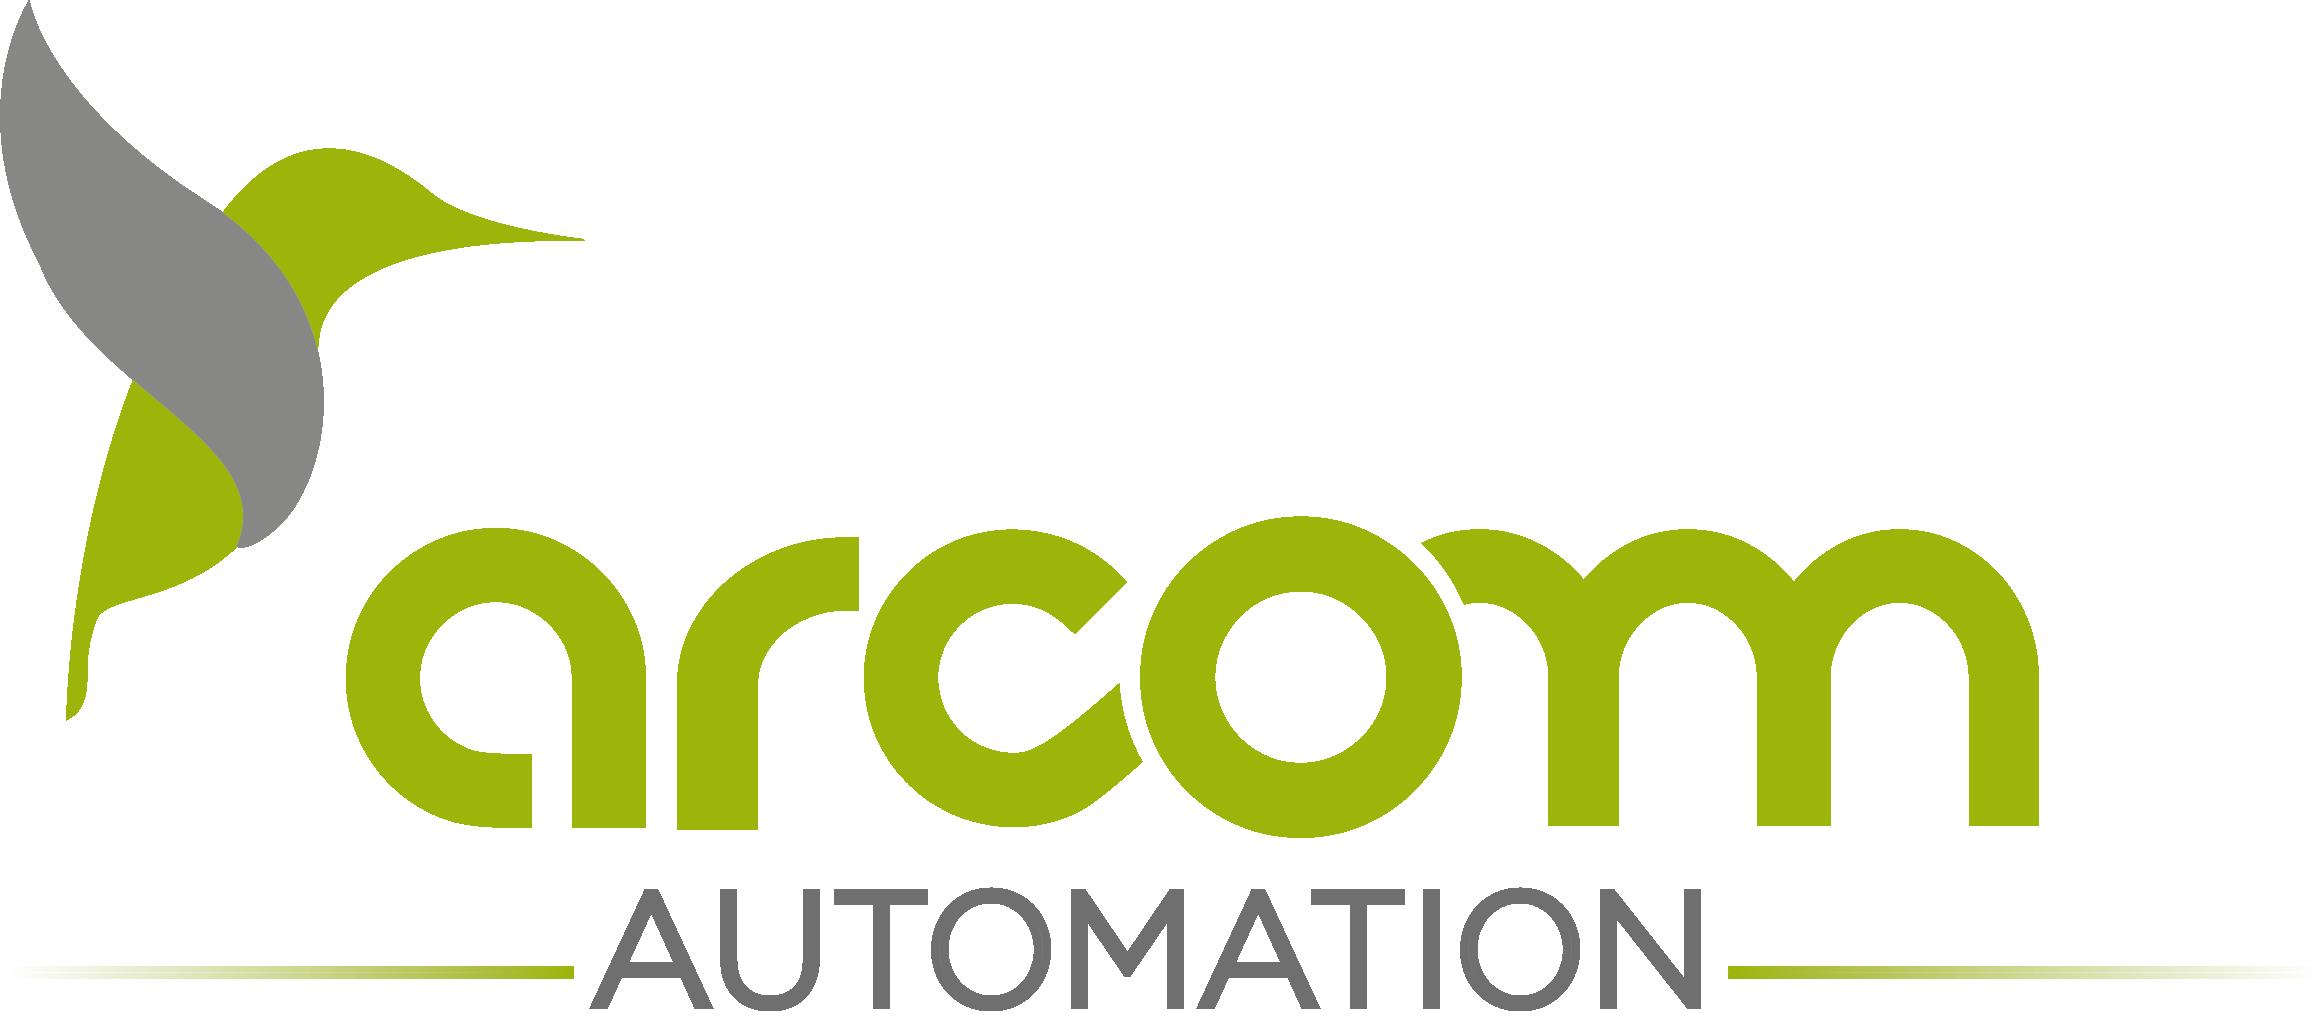 logo-arcom-automation-2017